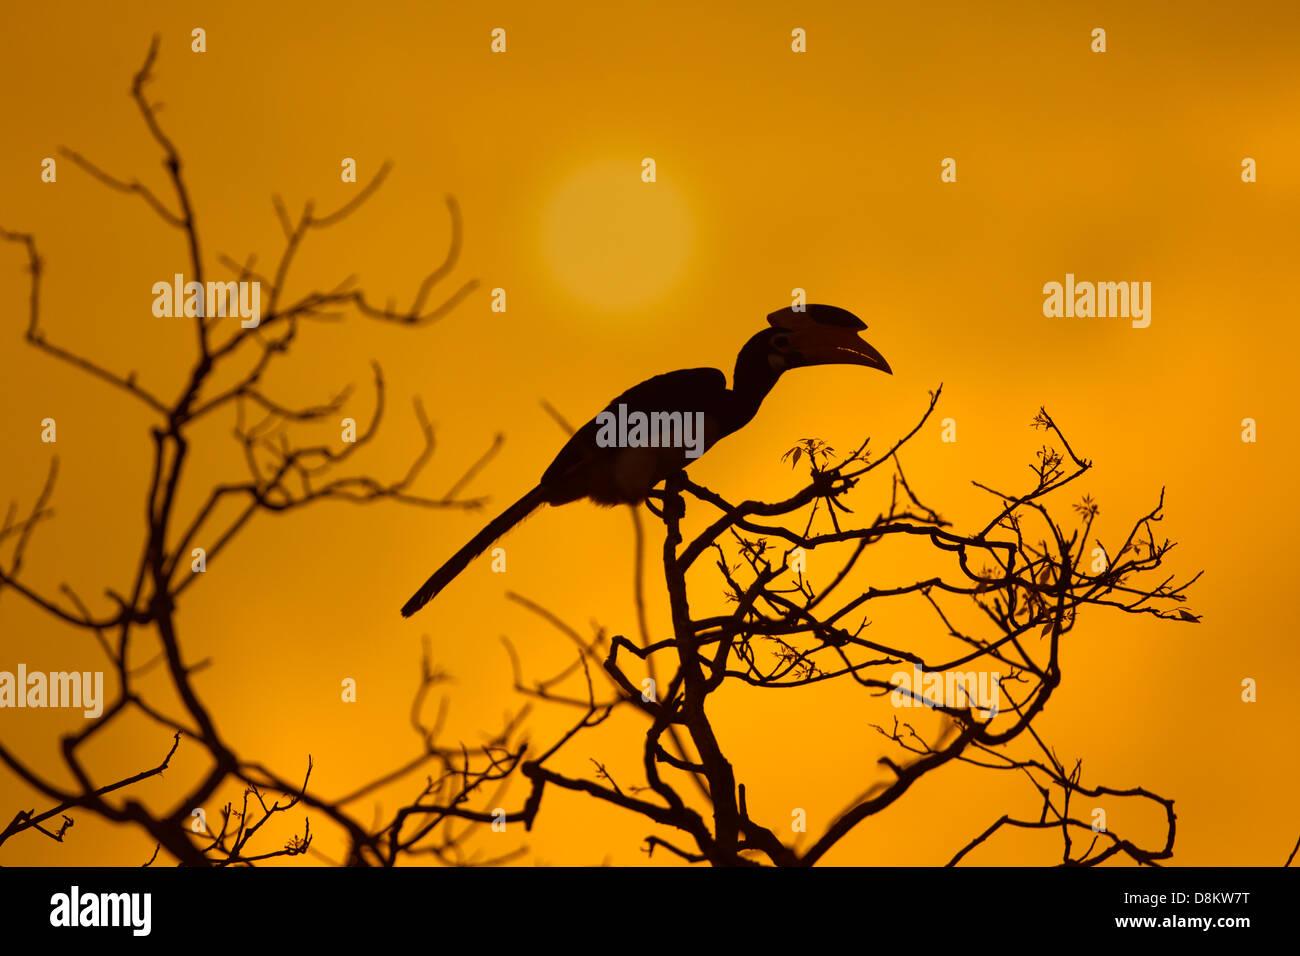 Malabar Pied Hornbill Anthracoceros coronatus at sunset - Stock Image